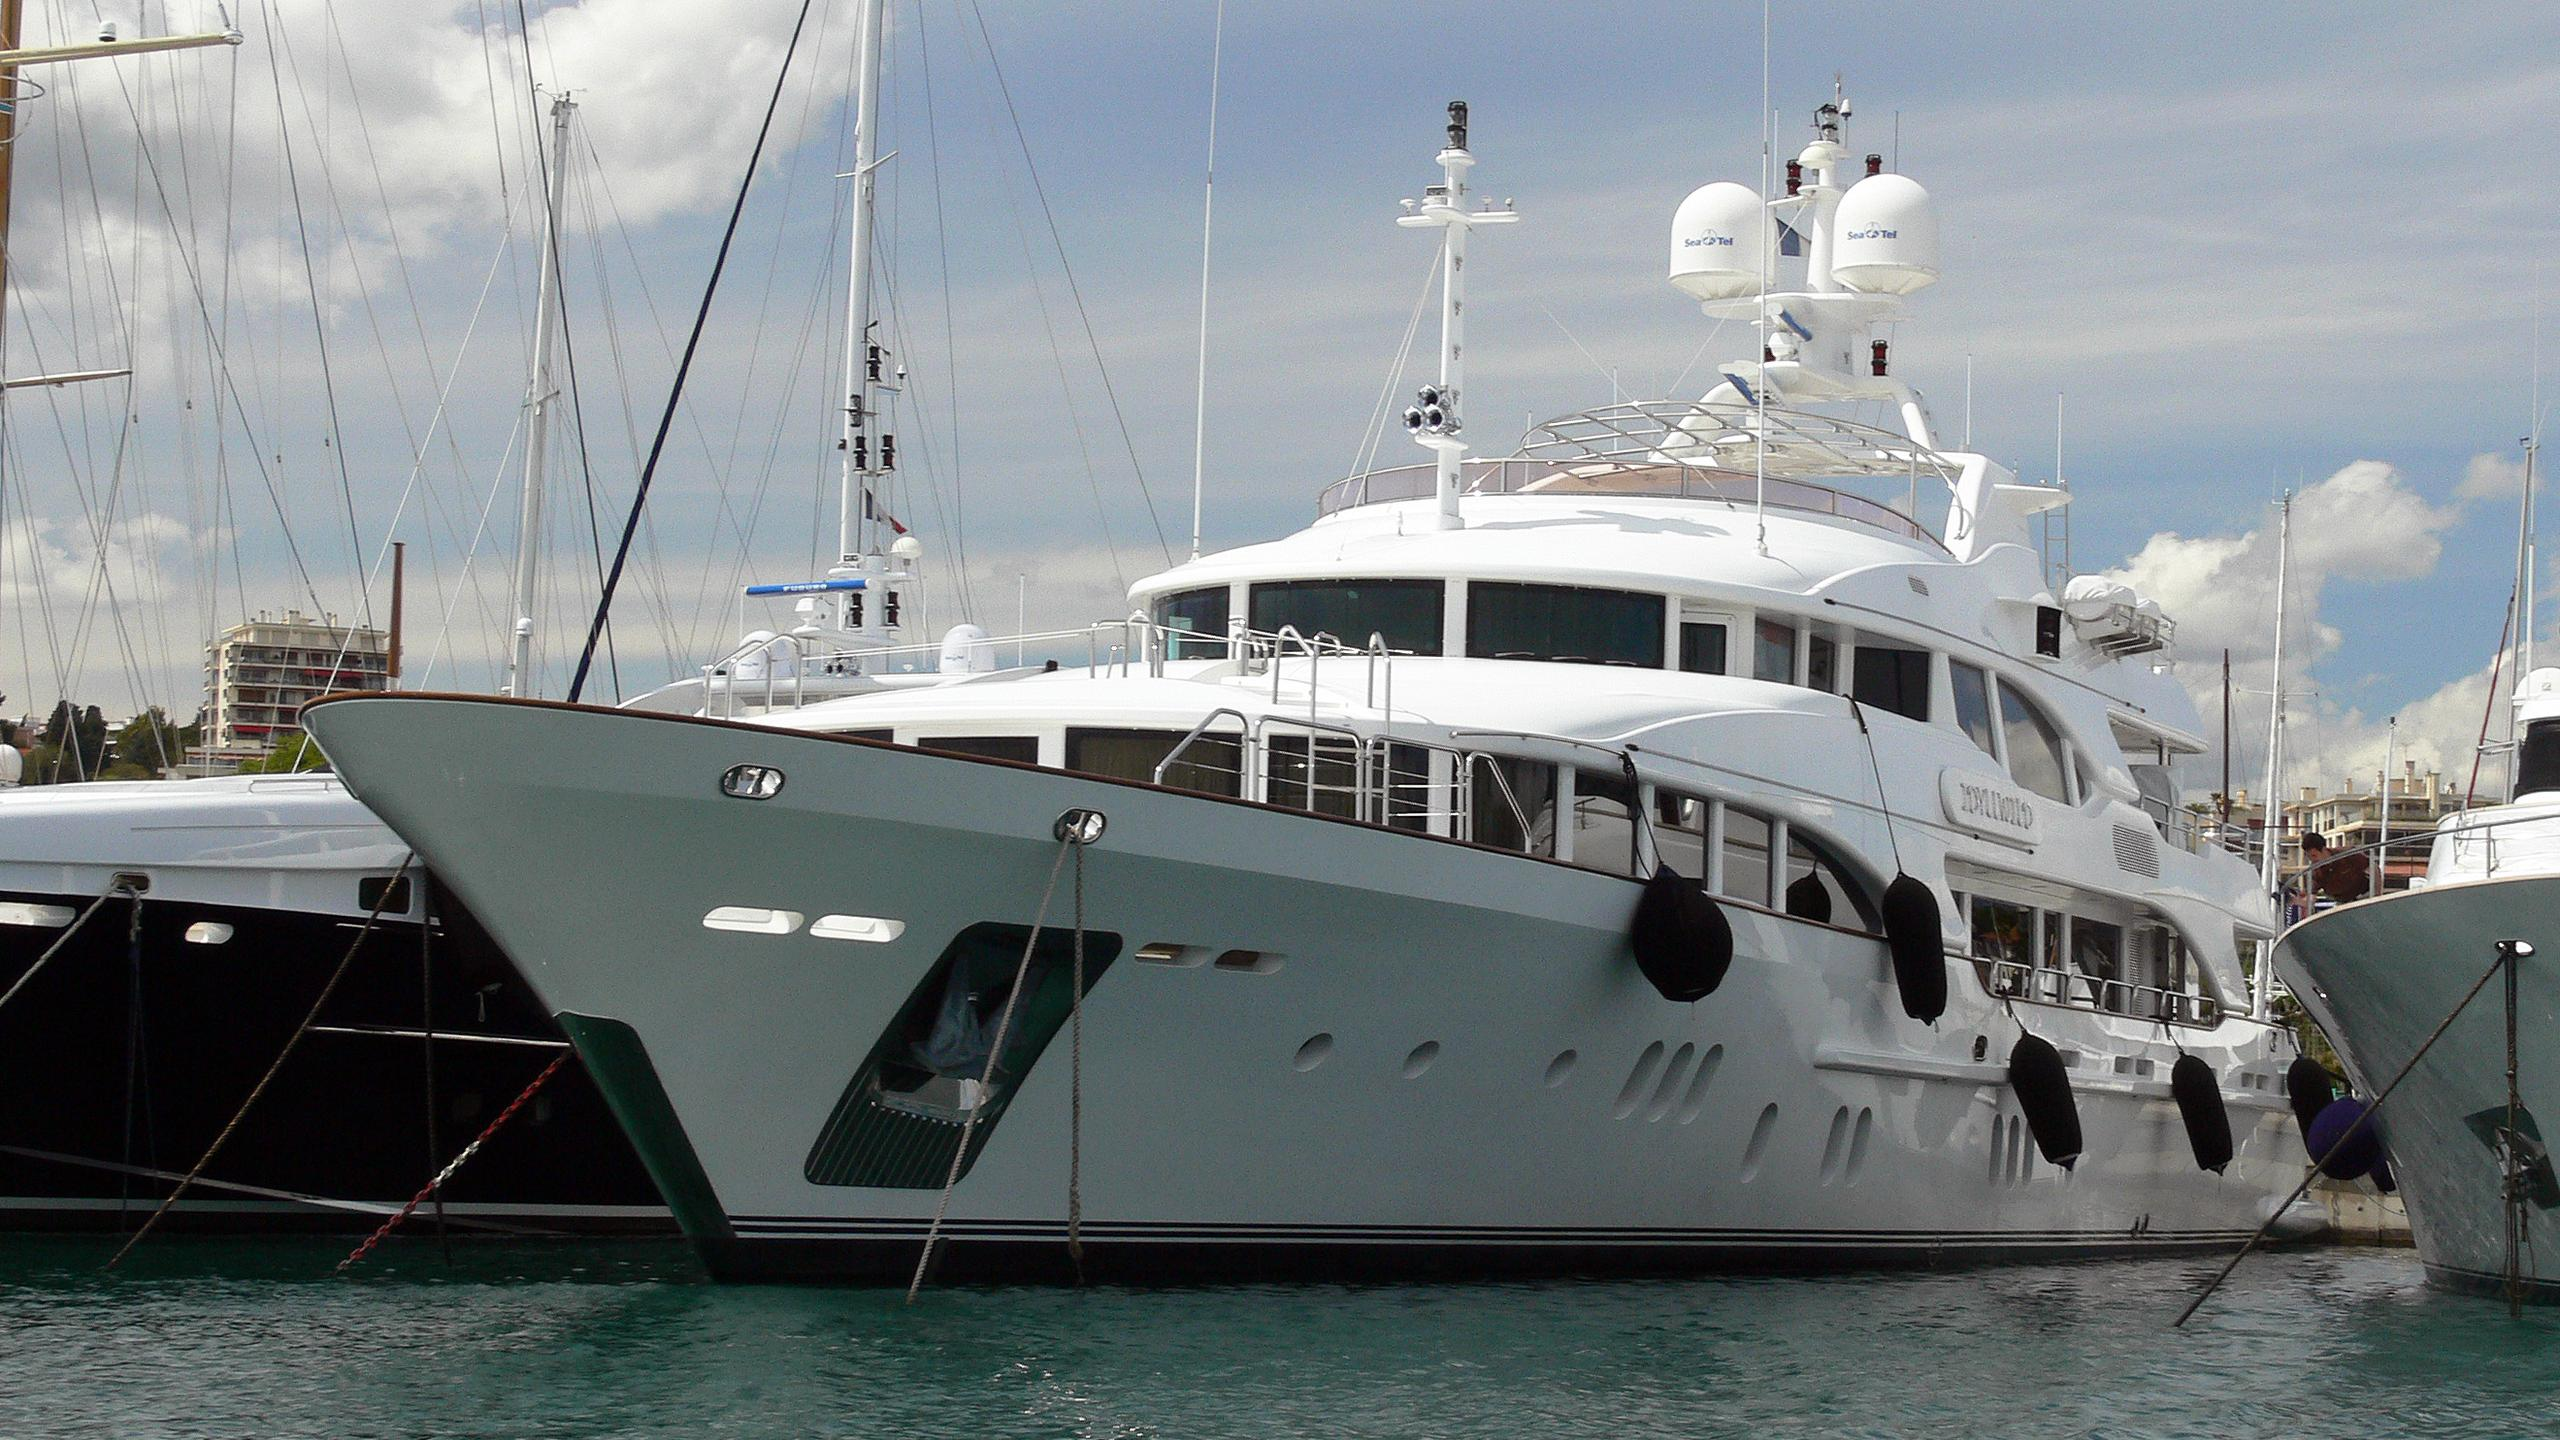 idyllwild-motor-yacht-benetti-vision-2005-44m-moored-bow